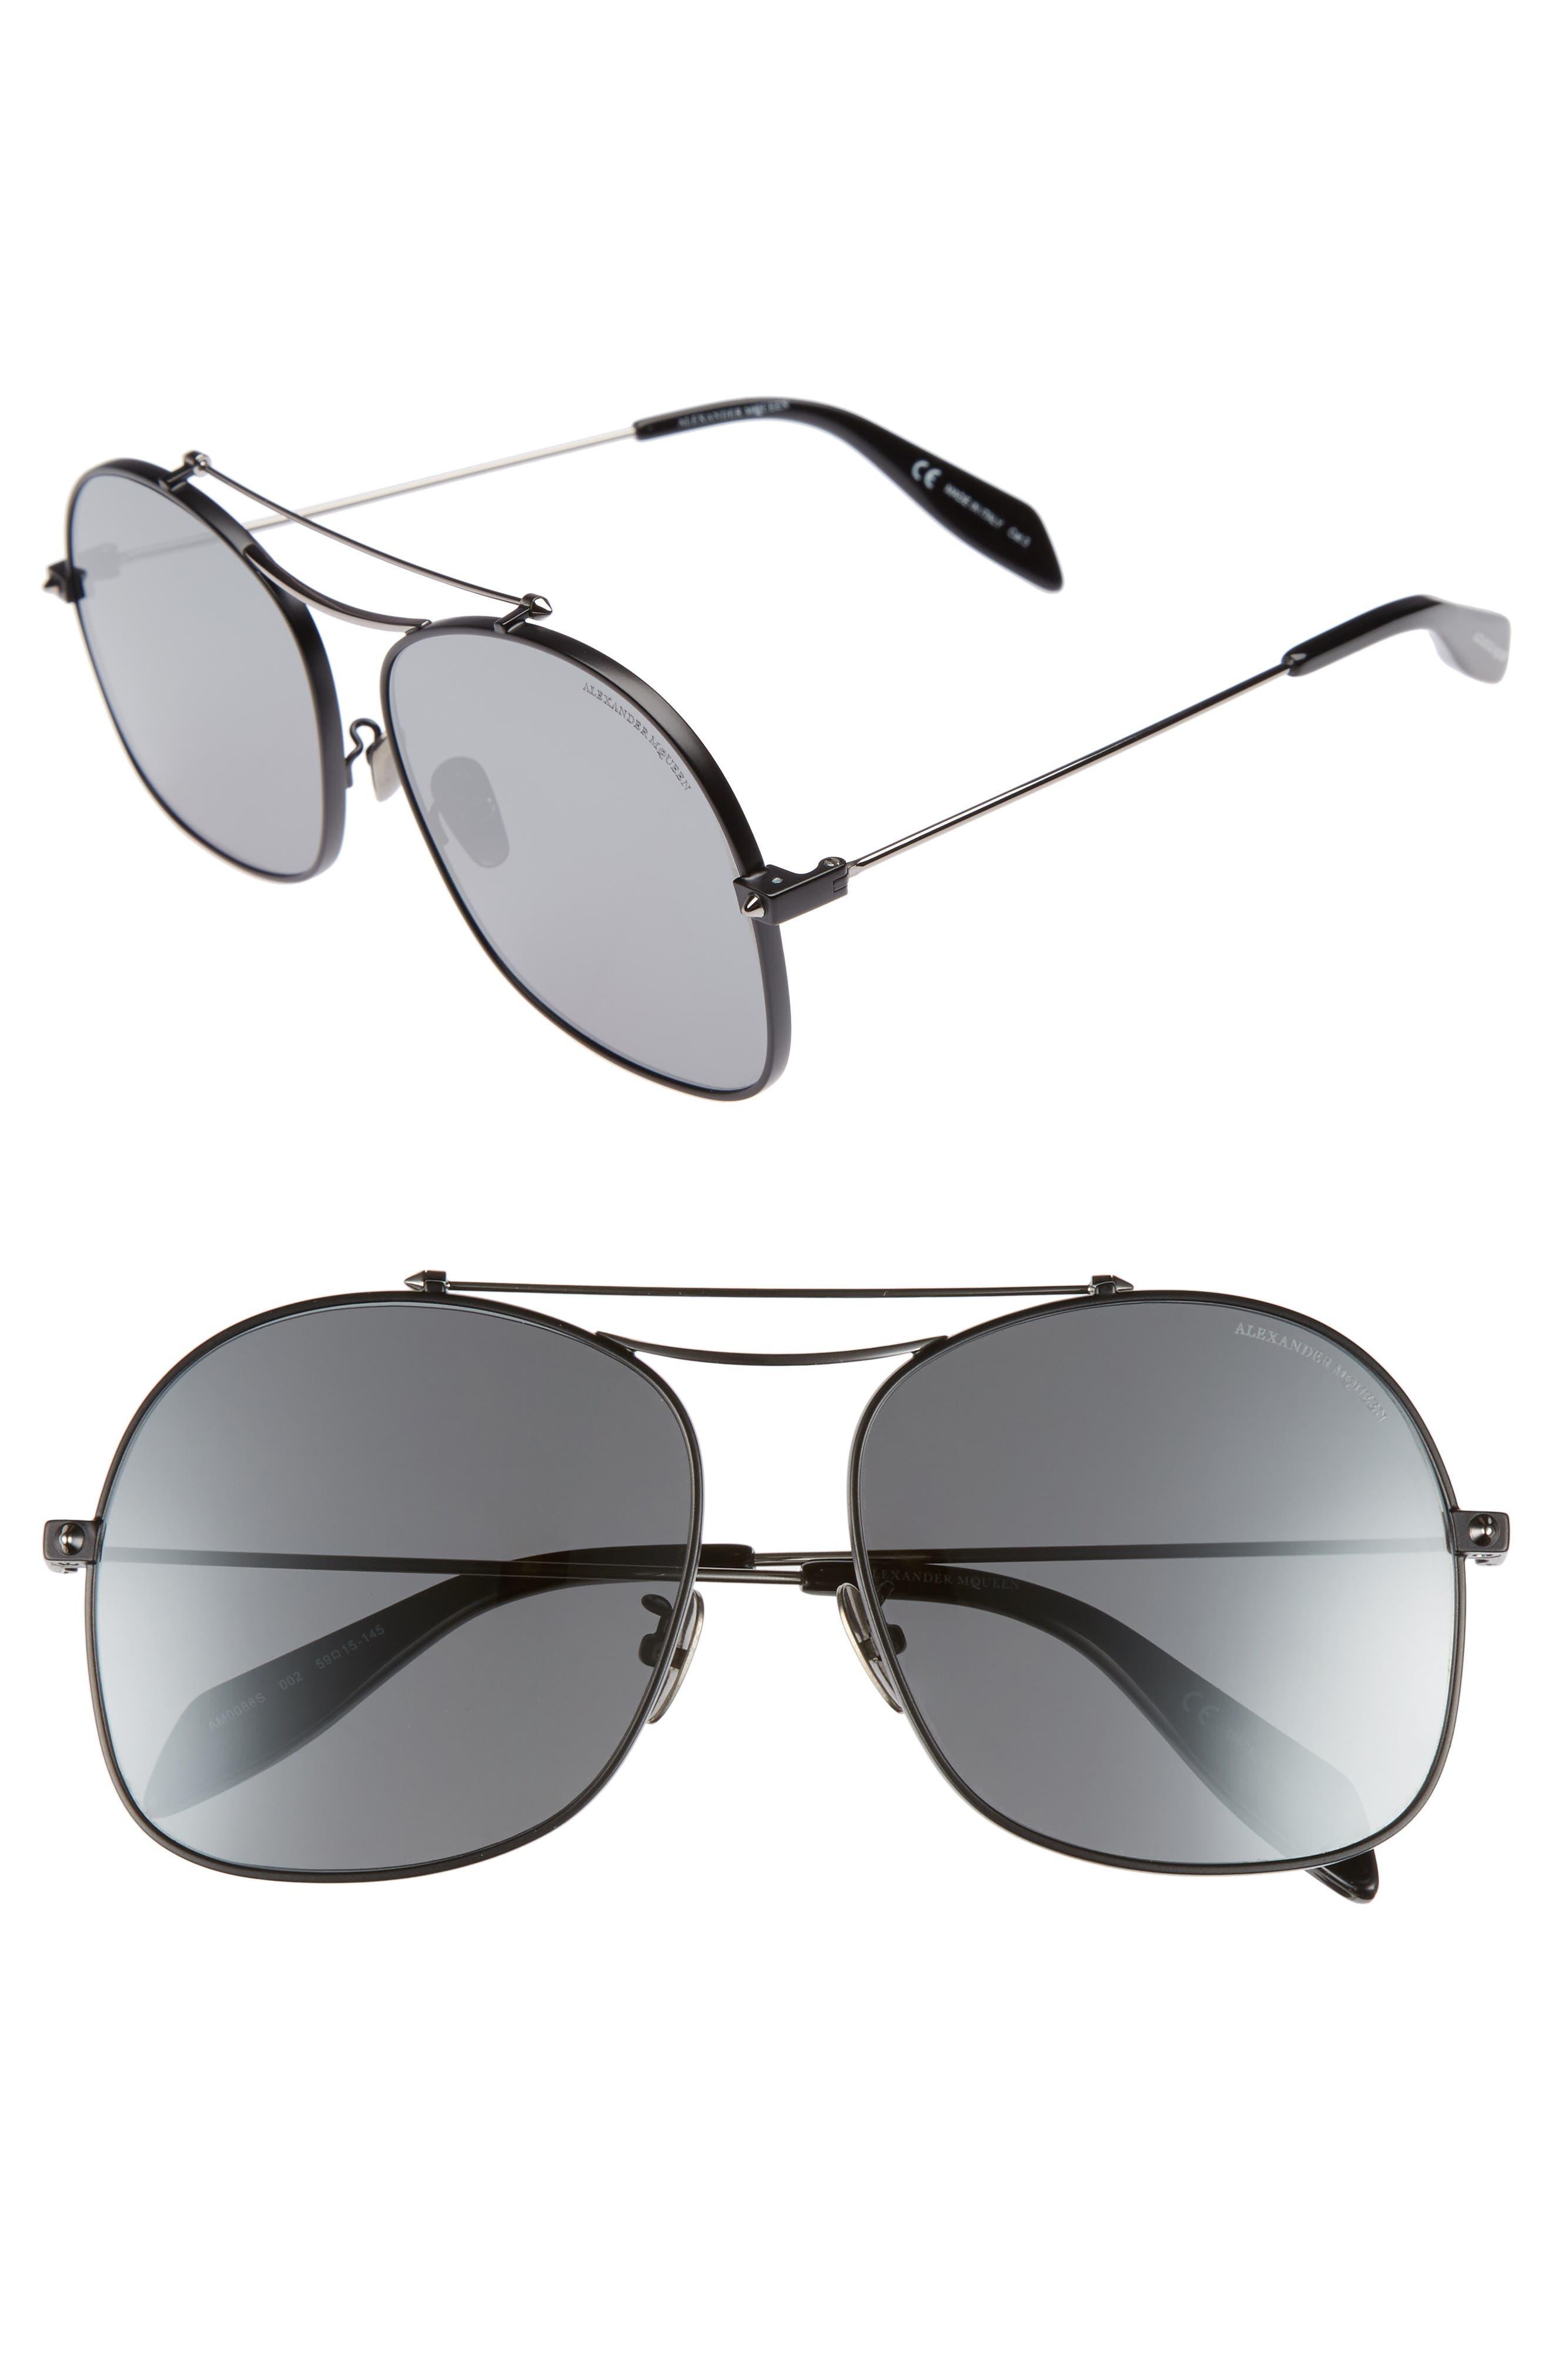 59mm Aviator Sunglasses,                         Main,                         color, Black